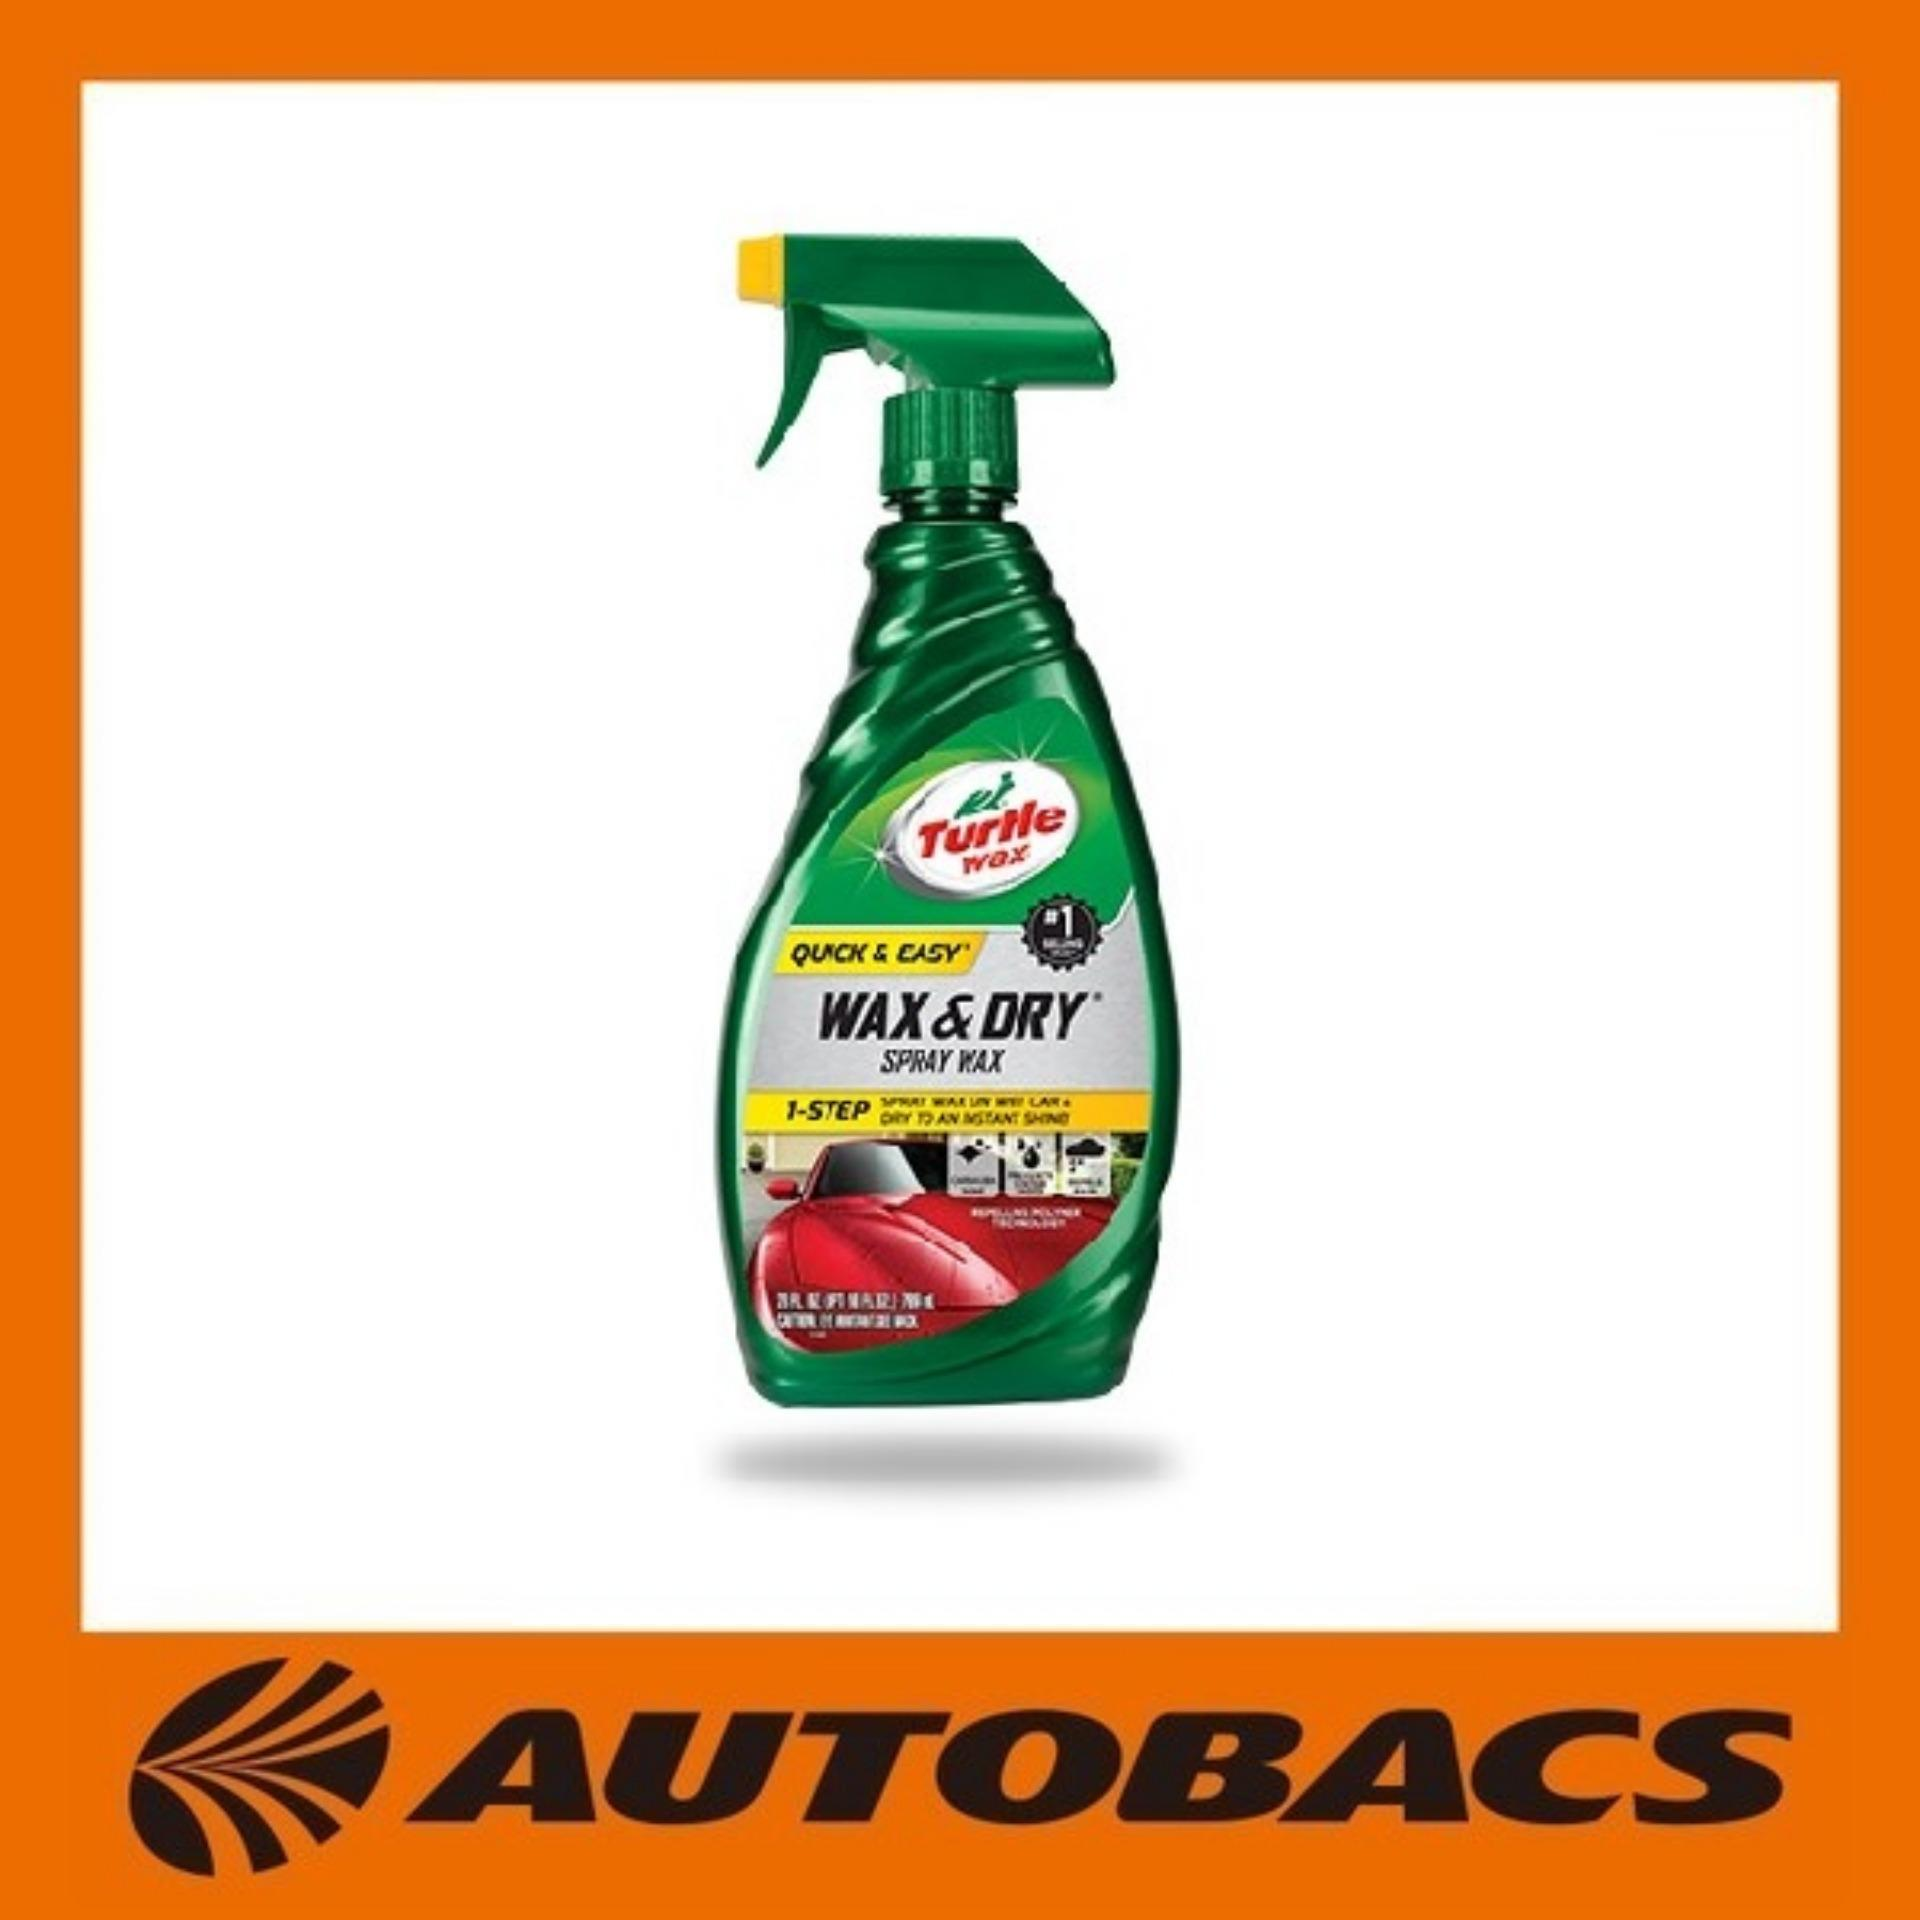 Sale Turtle Wax Quick Easy Wax Dry Spray Wax On Singapore